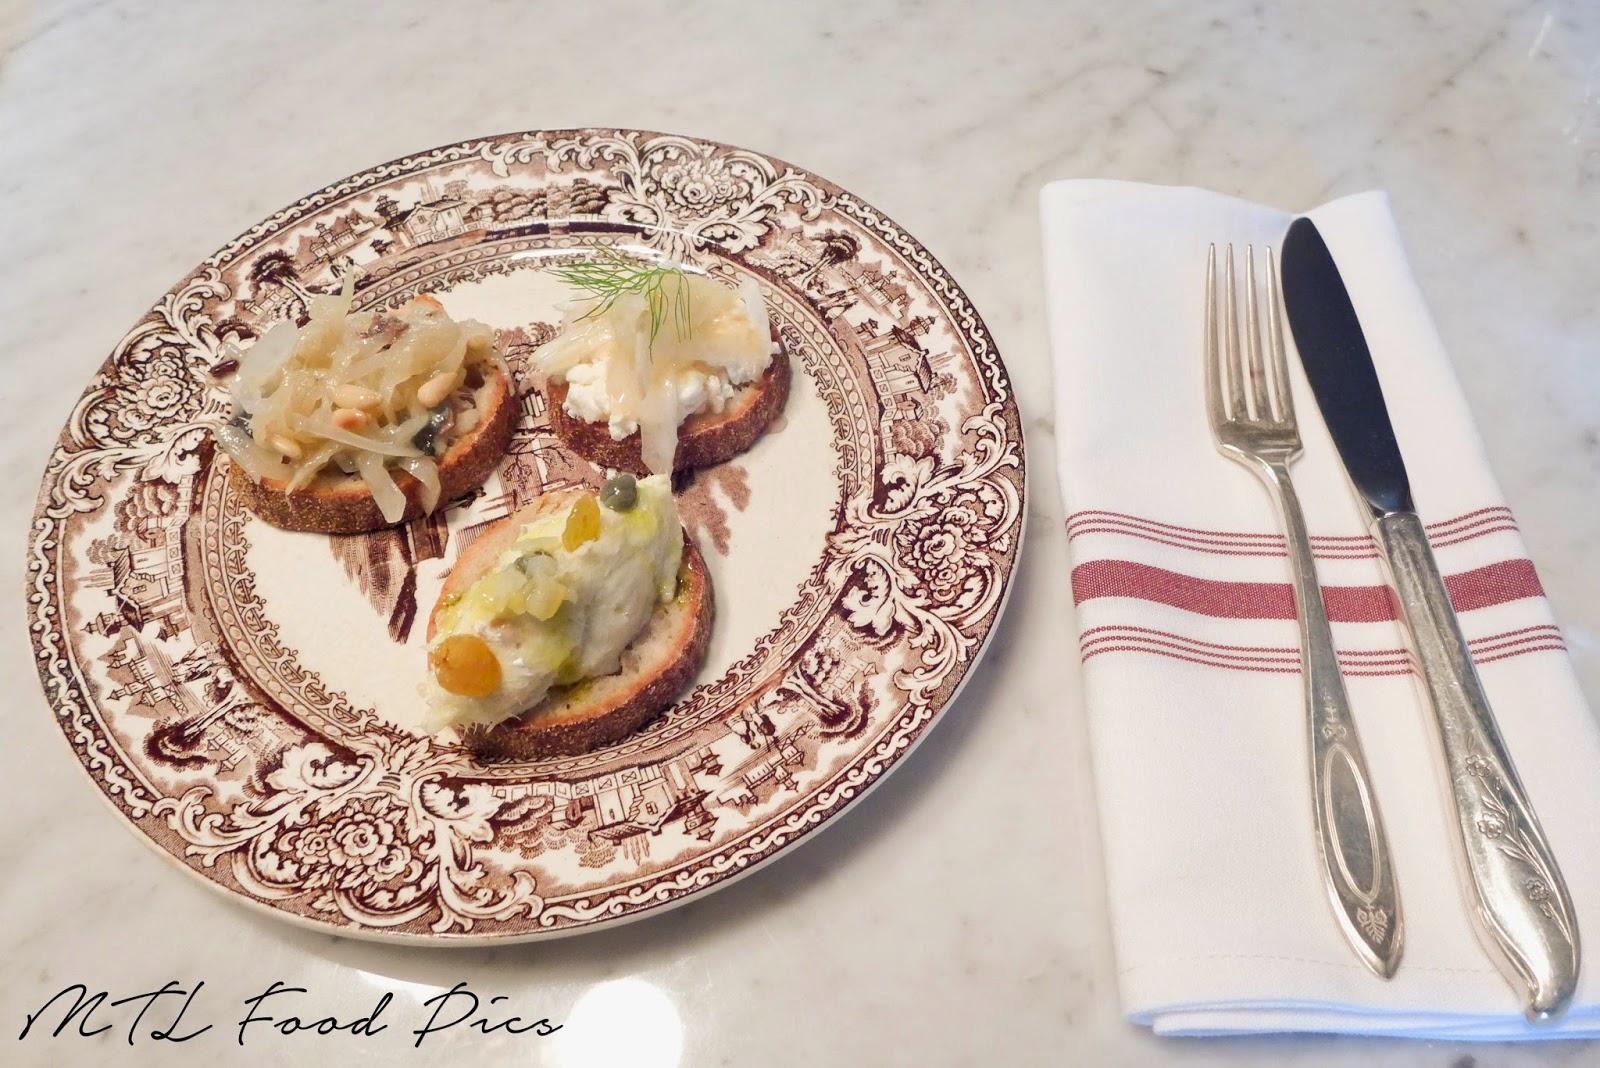 Cicchetti - North Italian Food Ottawa